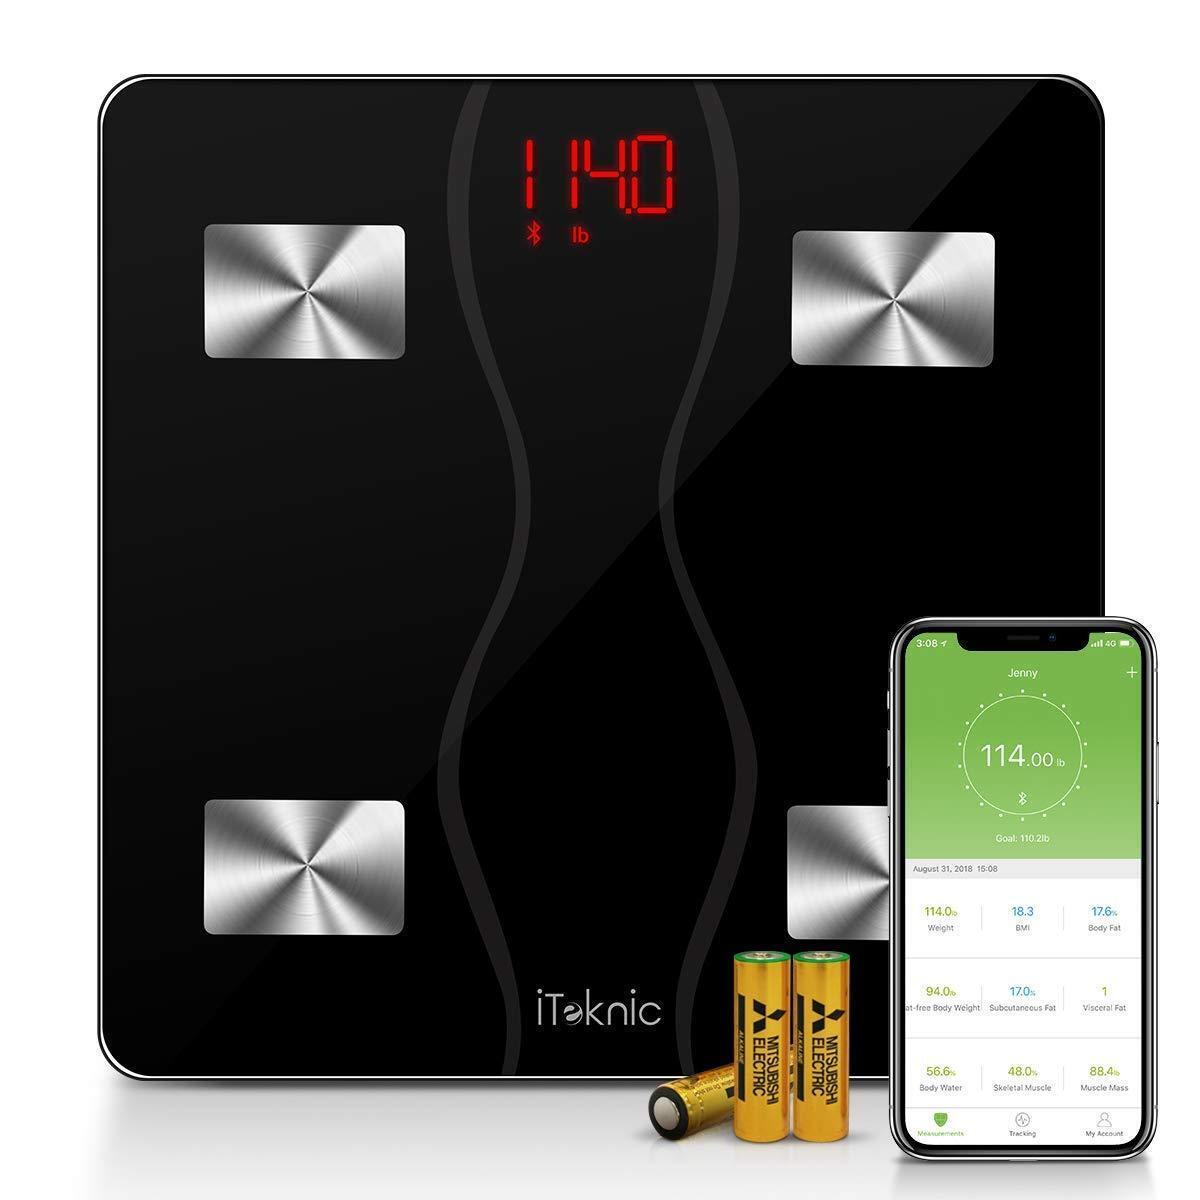 Body Fat Scale, 11 Health Measurements Digital Blautooth Bathroom Weight Monitor